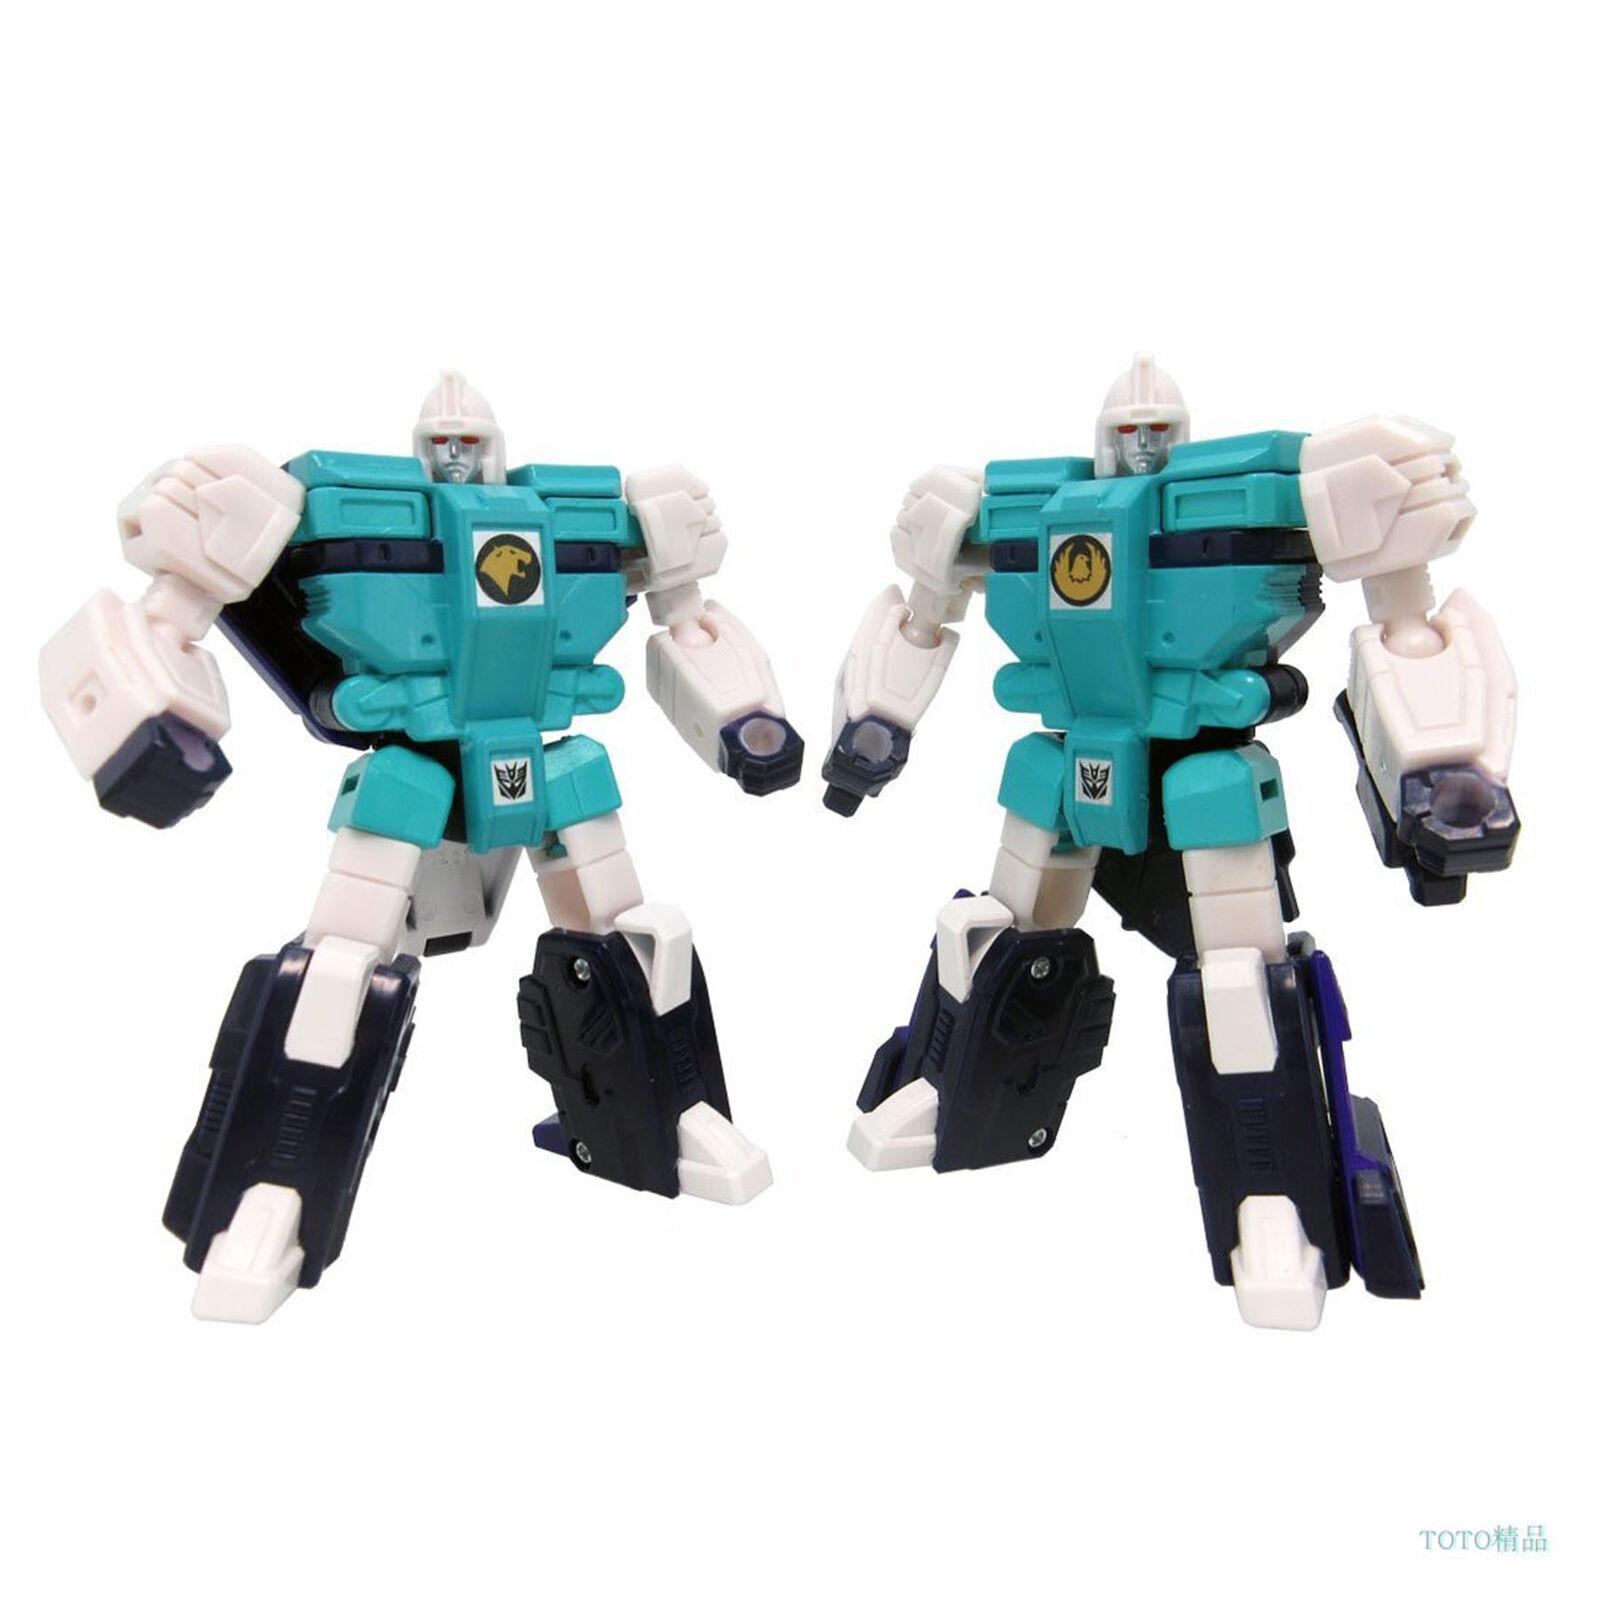 Transformers Legends LG 61 Decepticon Clones LG-61 Action Figure Spielzeug Neu